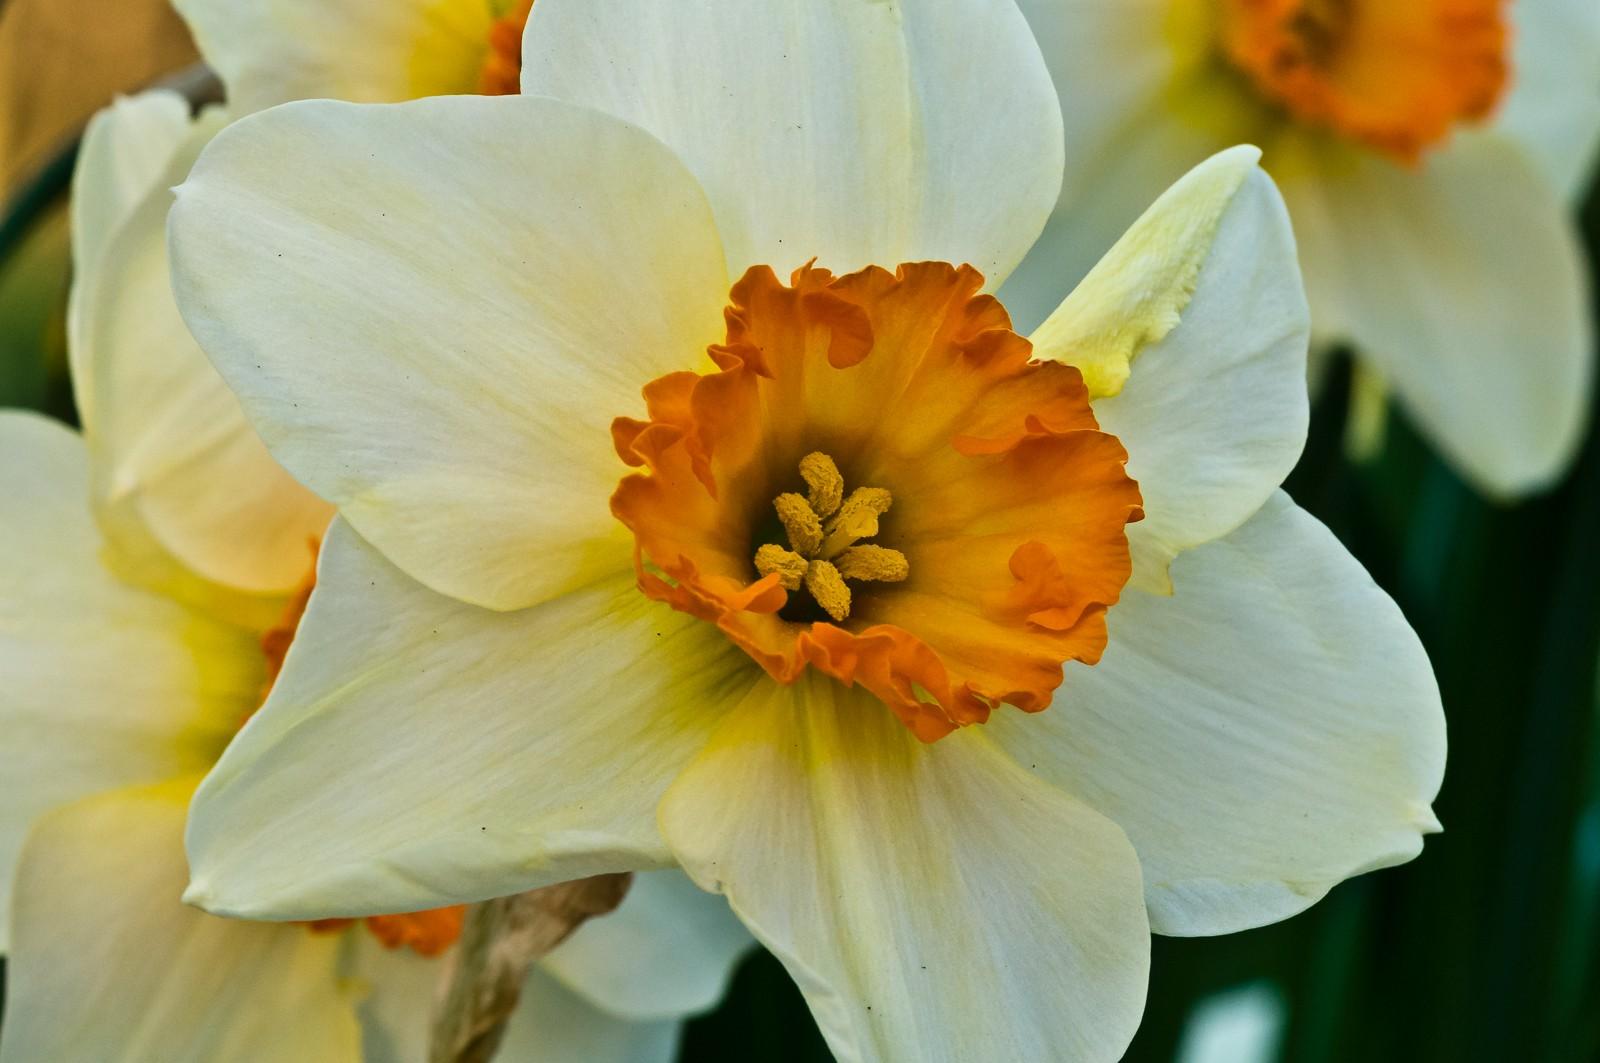 daffodils-6809